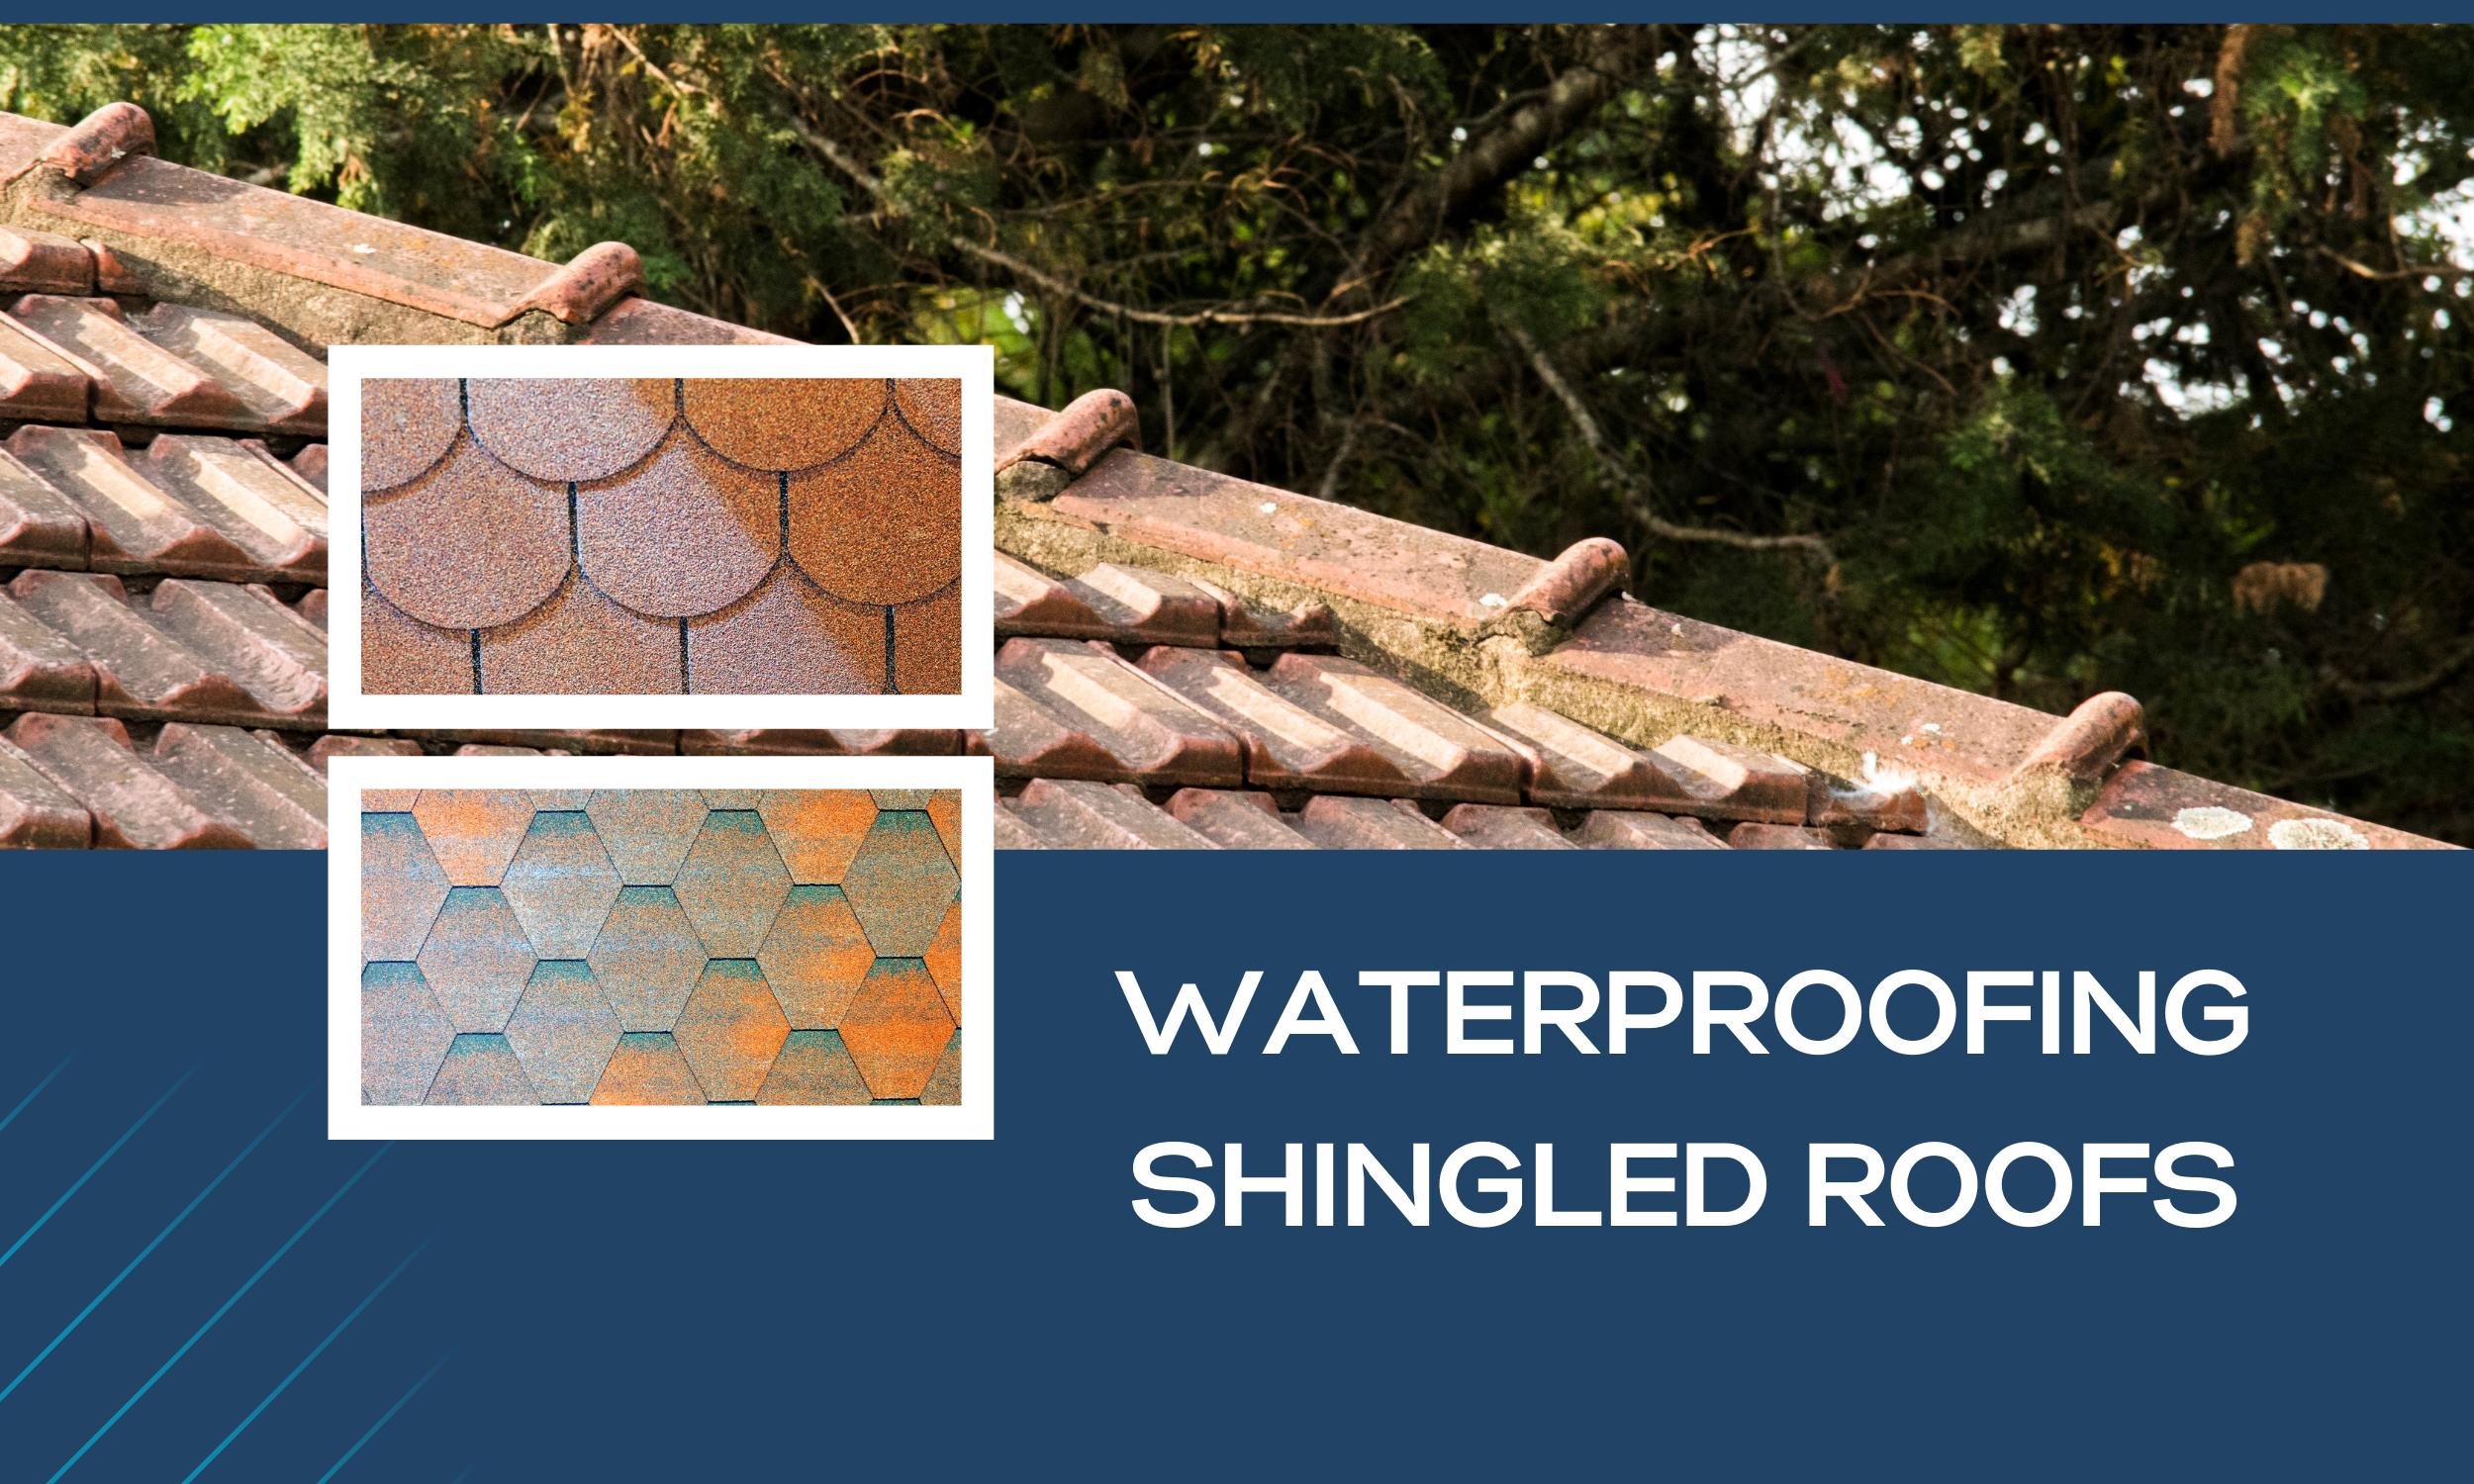 Waterproofing-shingled-roofs